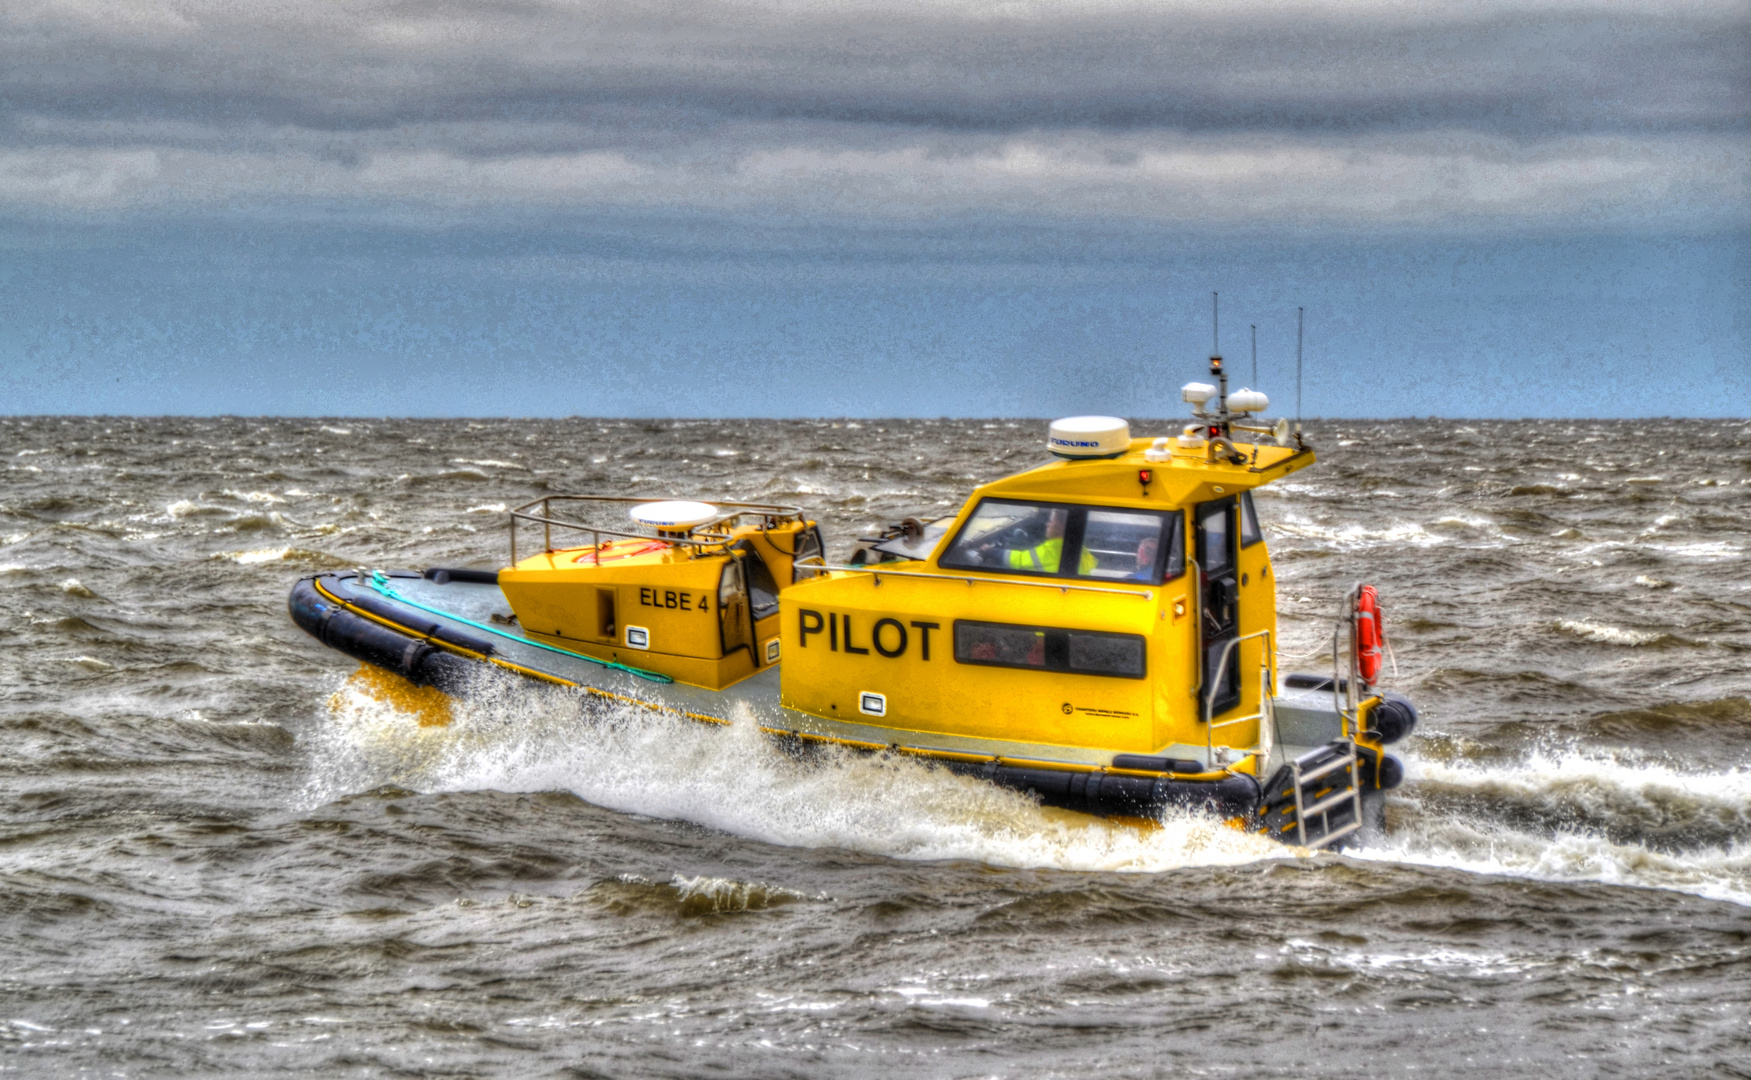 Lotsenboot Elbe 4 vor Cuxhaven